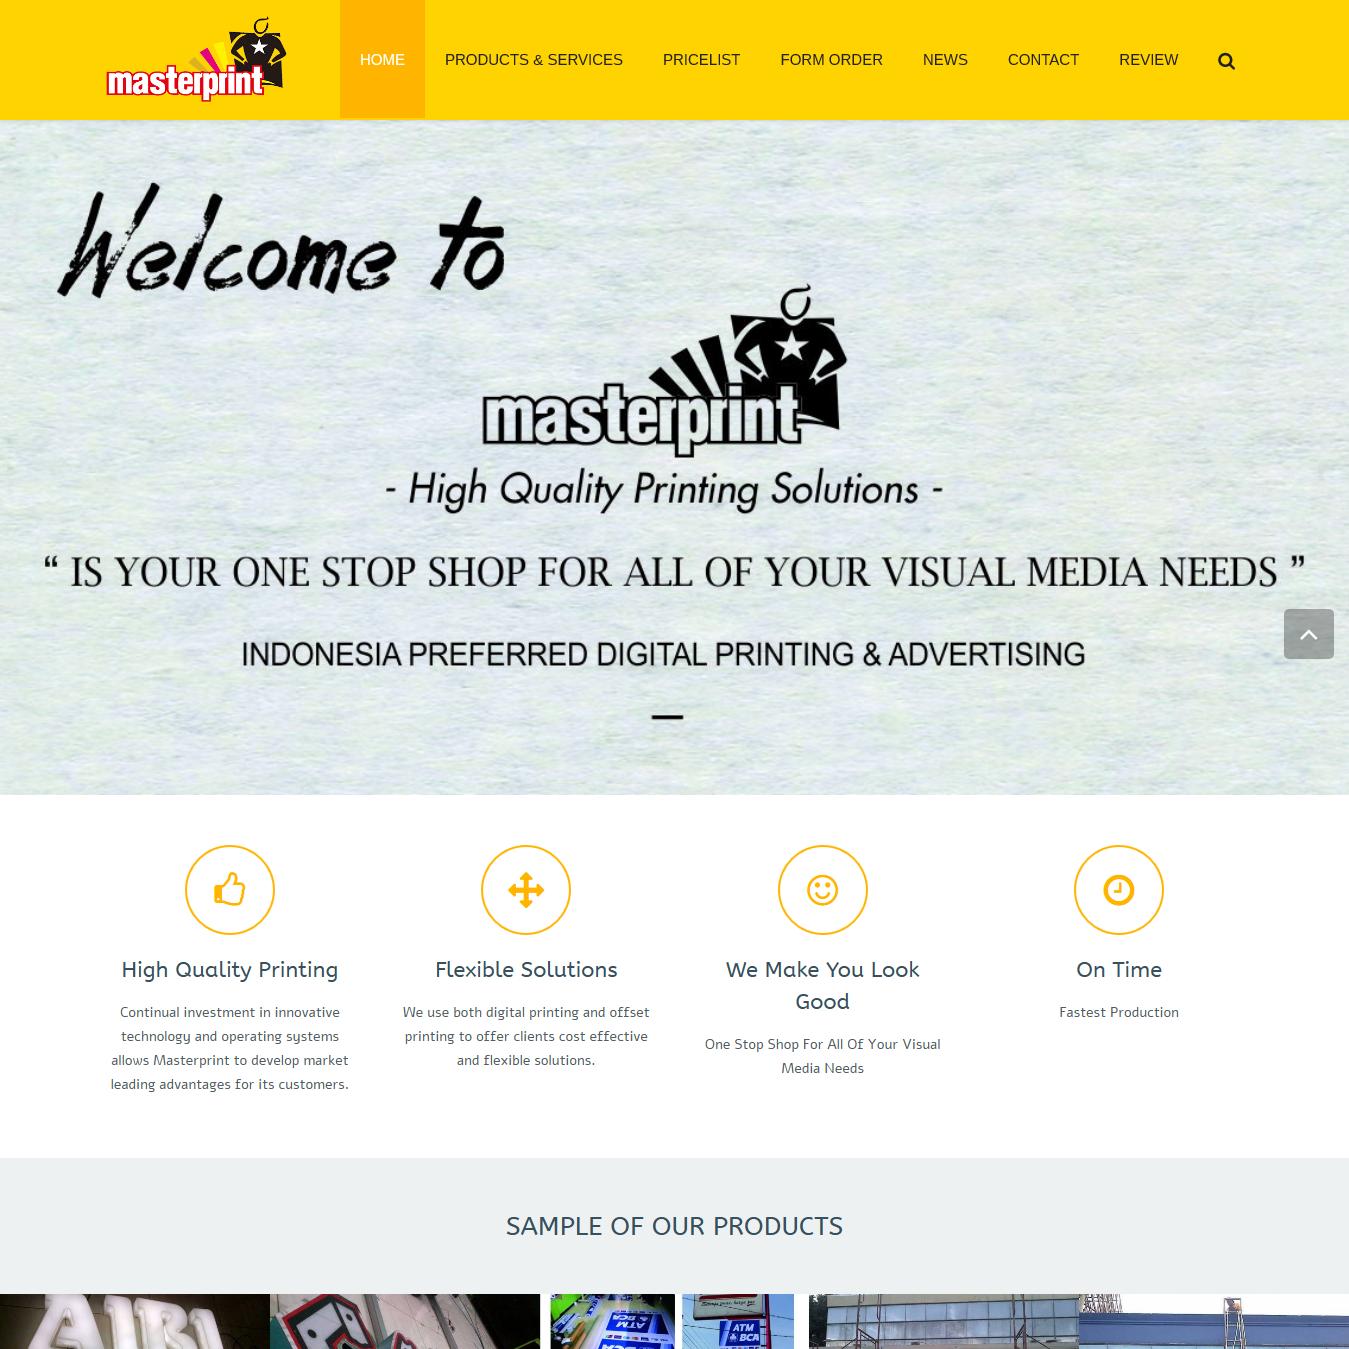 MasterPrint Surabaya - Digital Printing SurabayaMasterprint - Digital Printing Surabaya